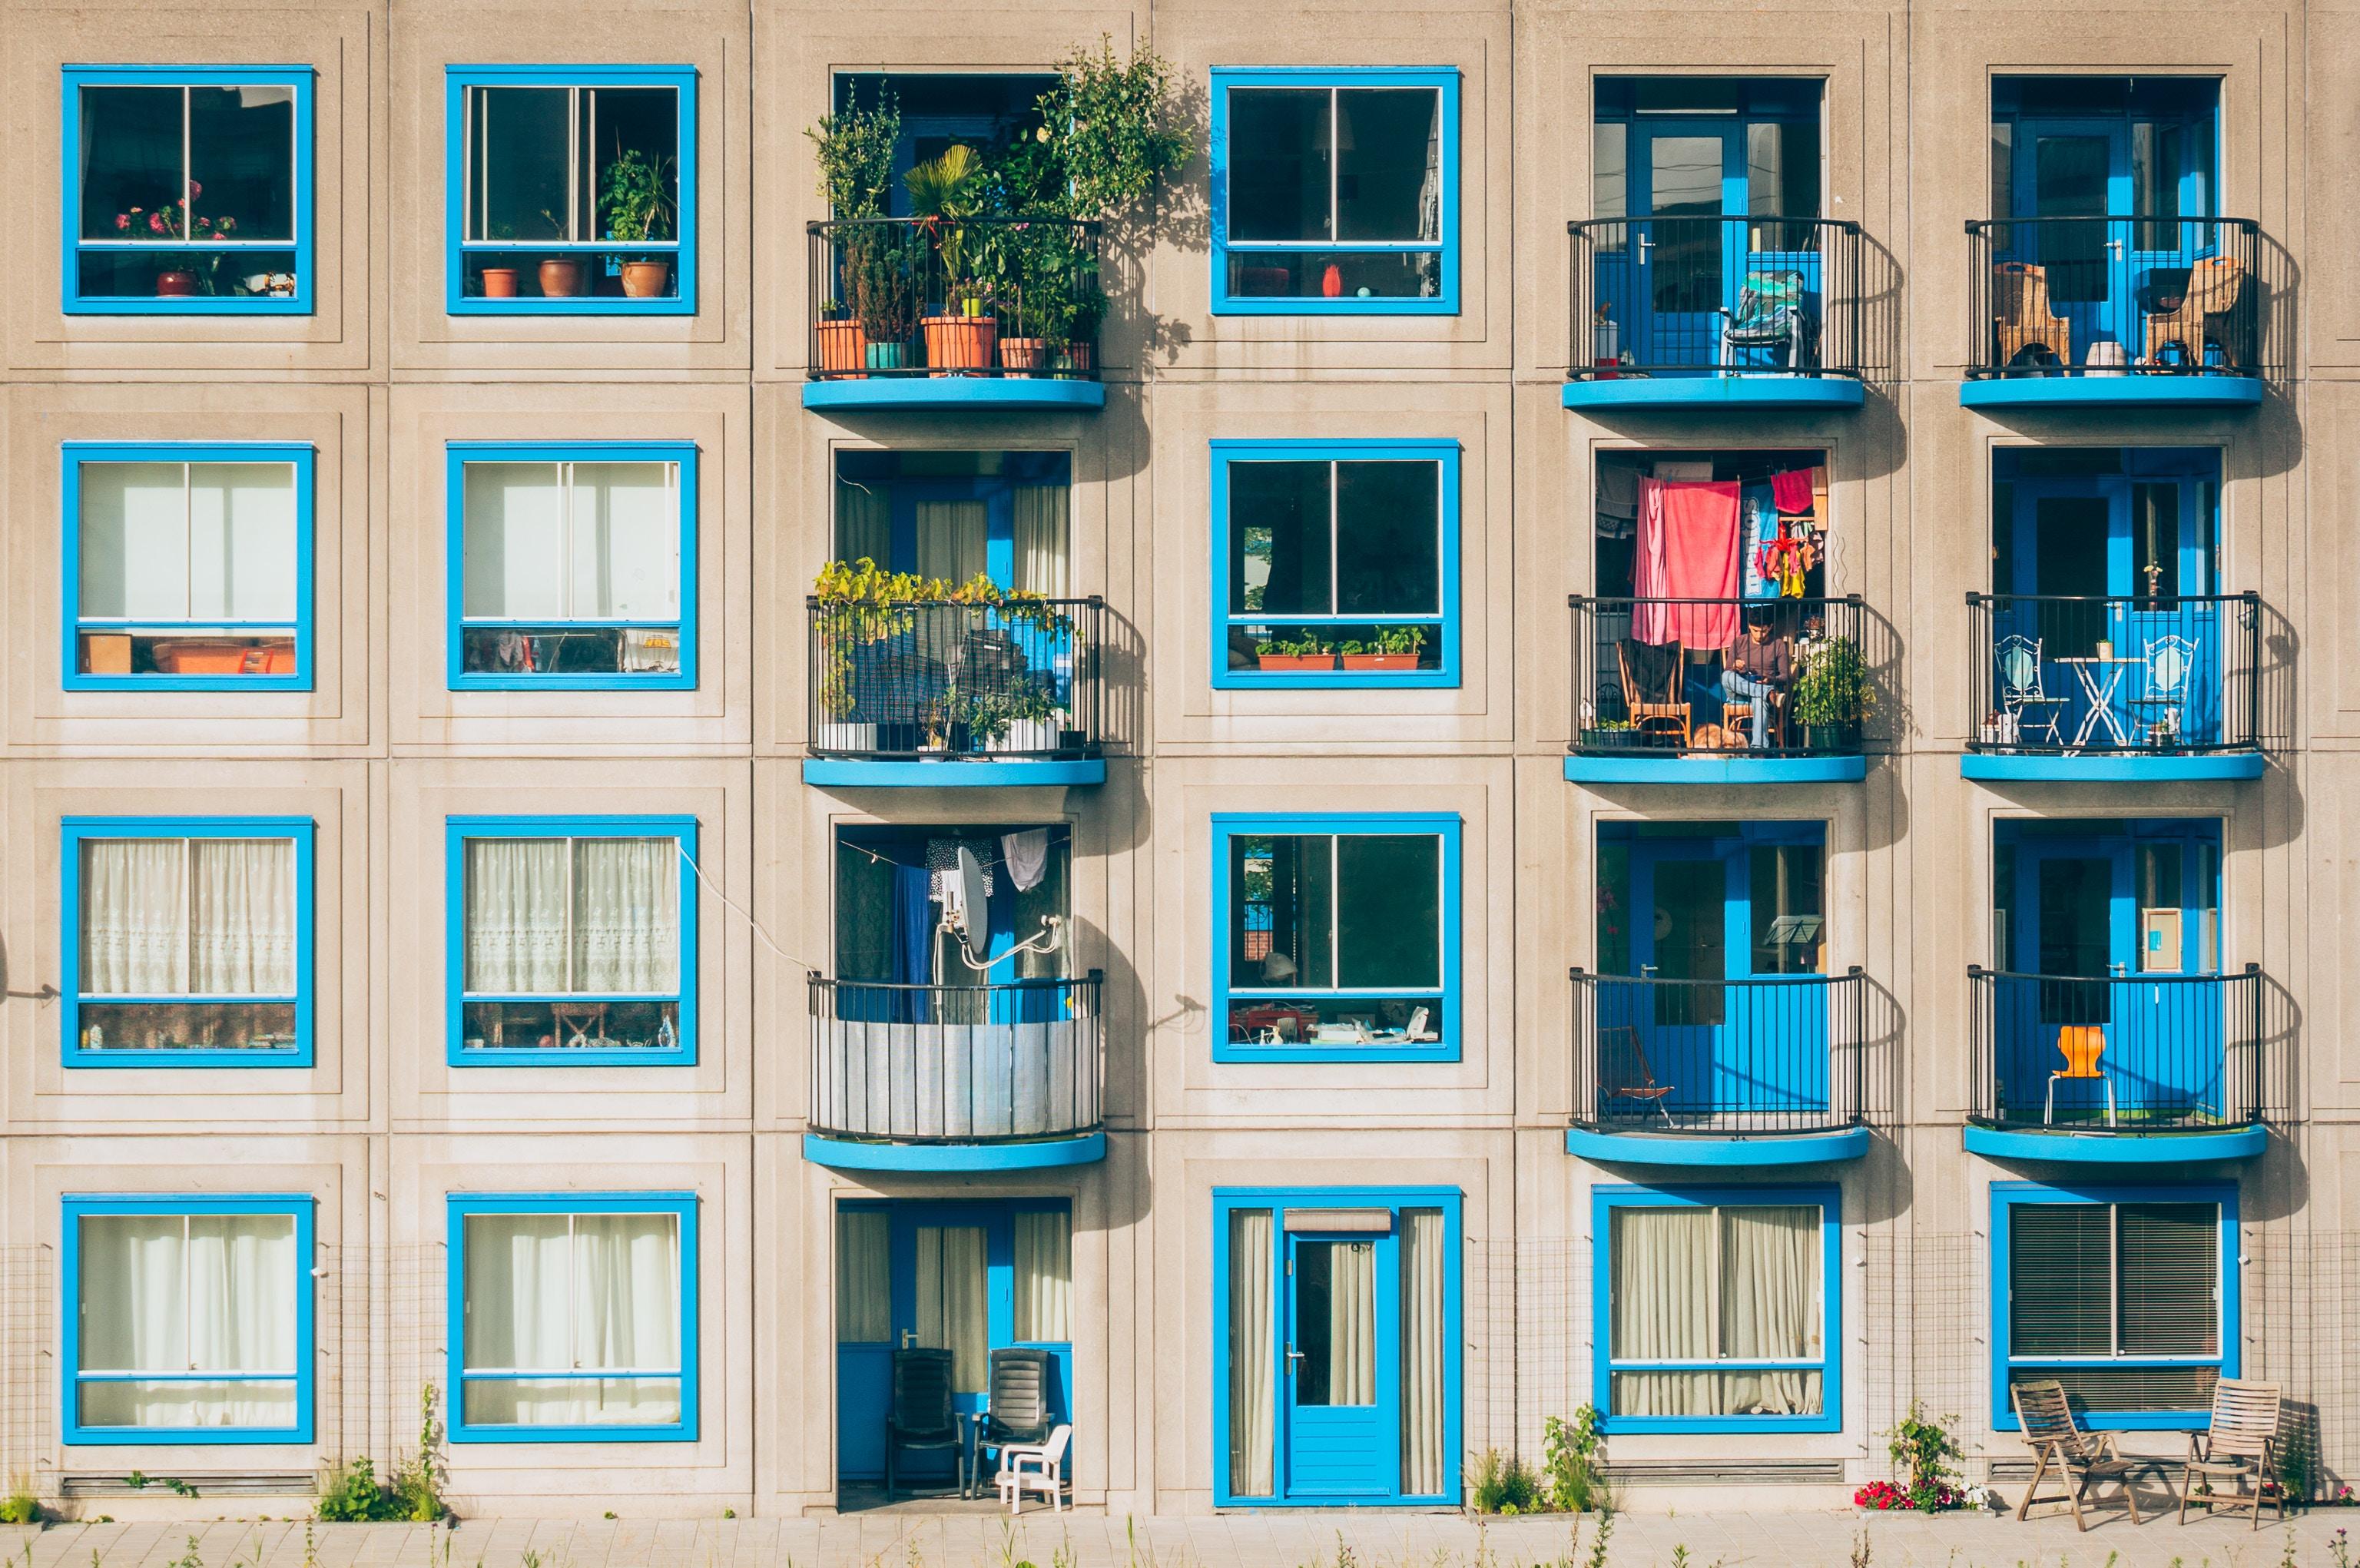 Utilitising European technical assistance for municipal retrofits